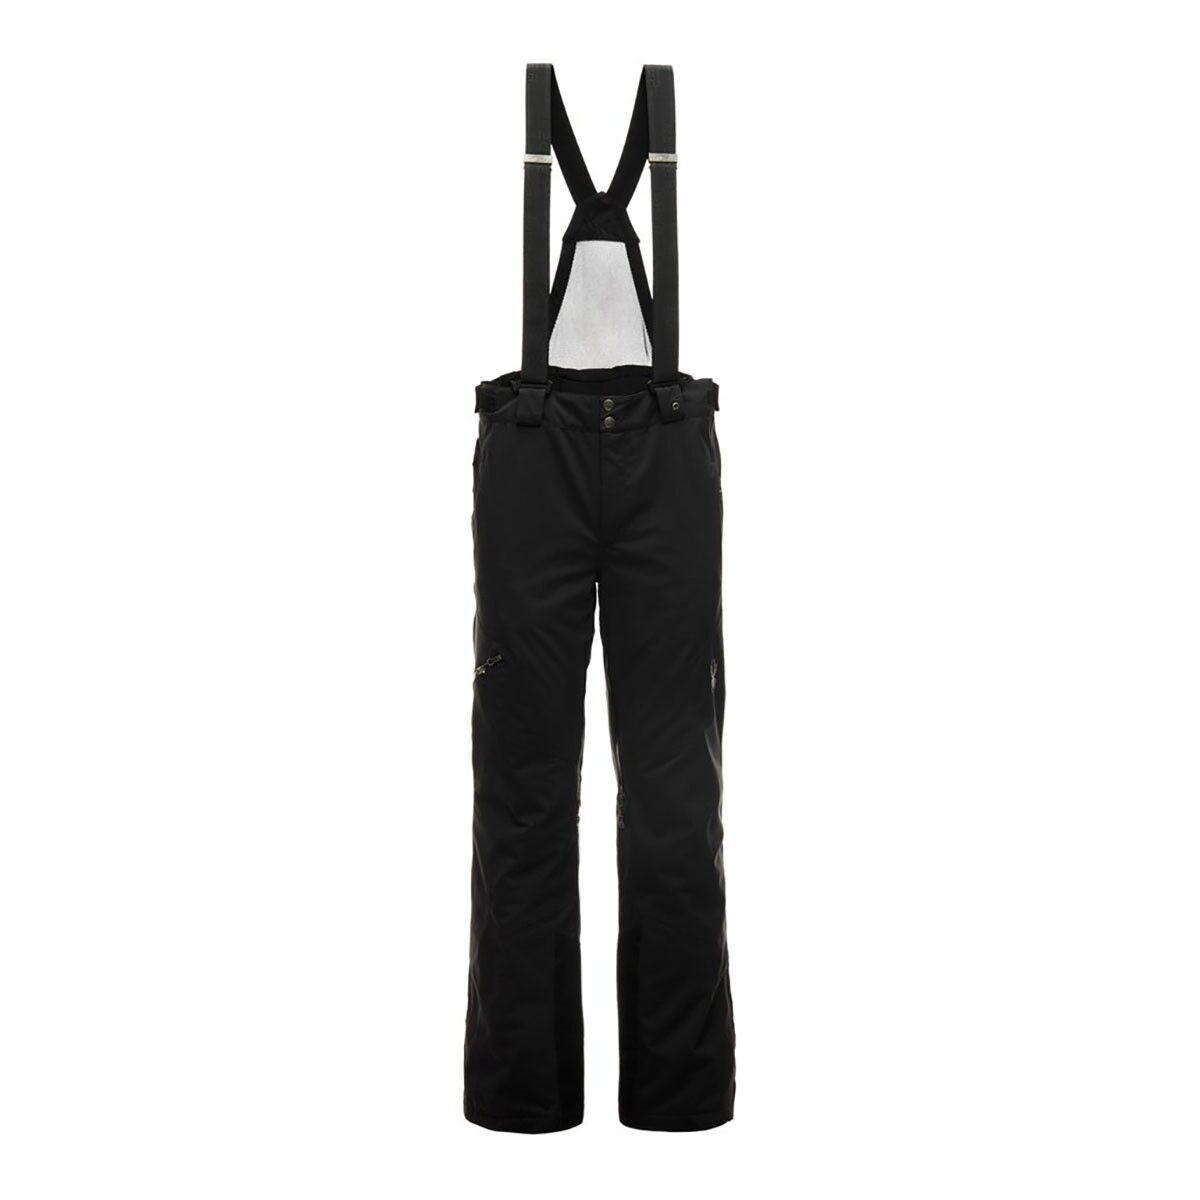 Spyder Dare Tailored GTX Pants Skihose black